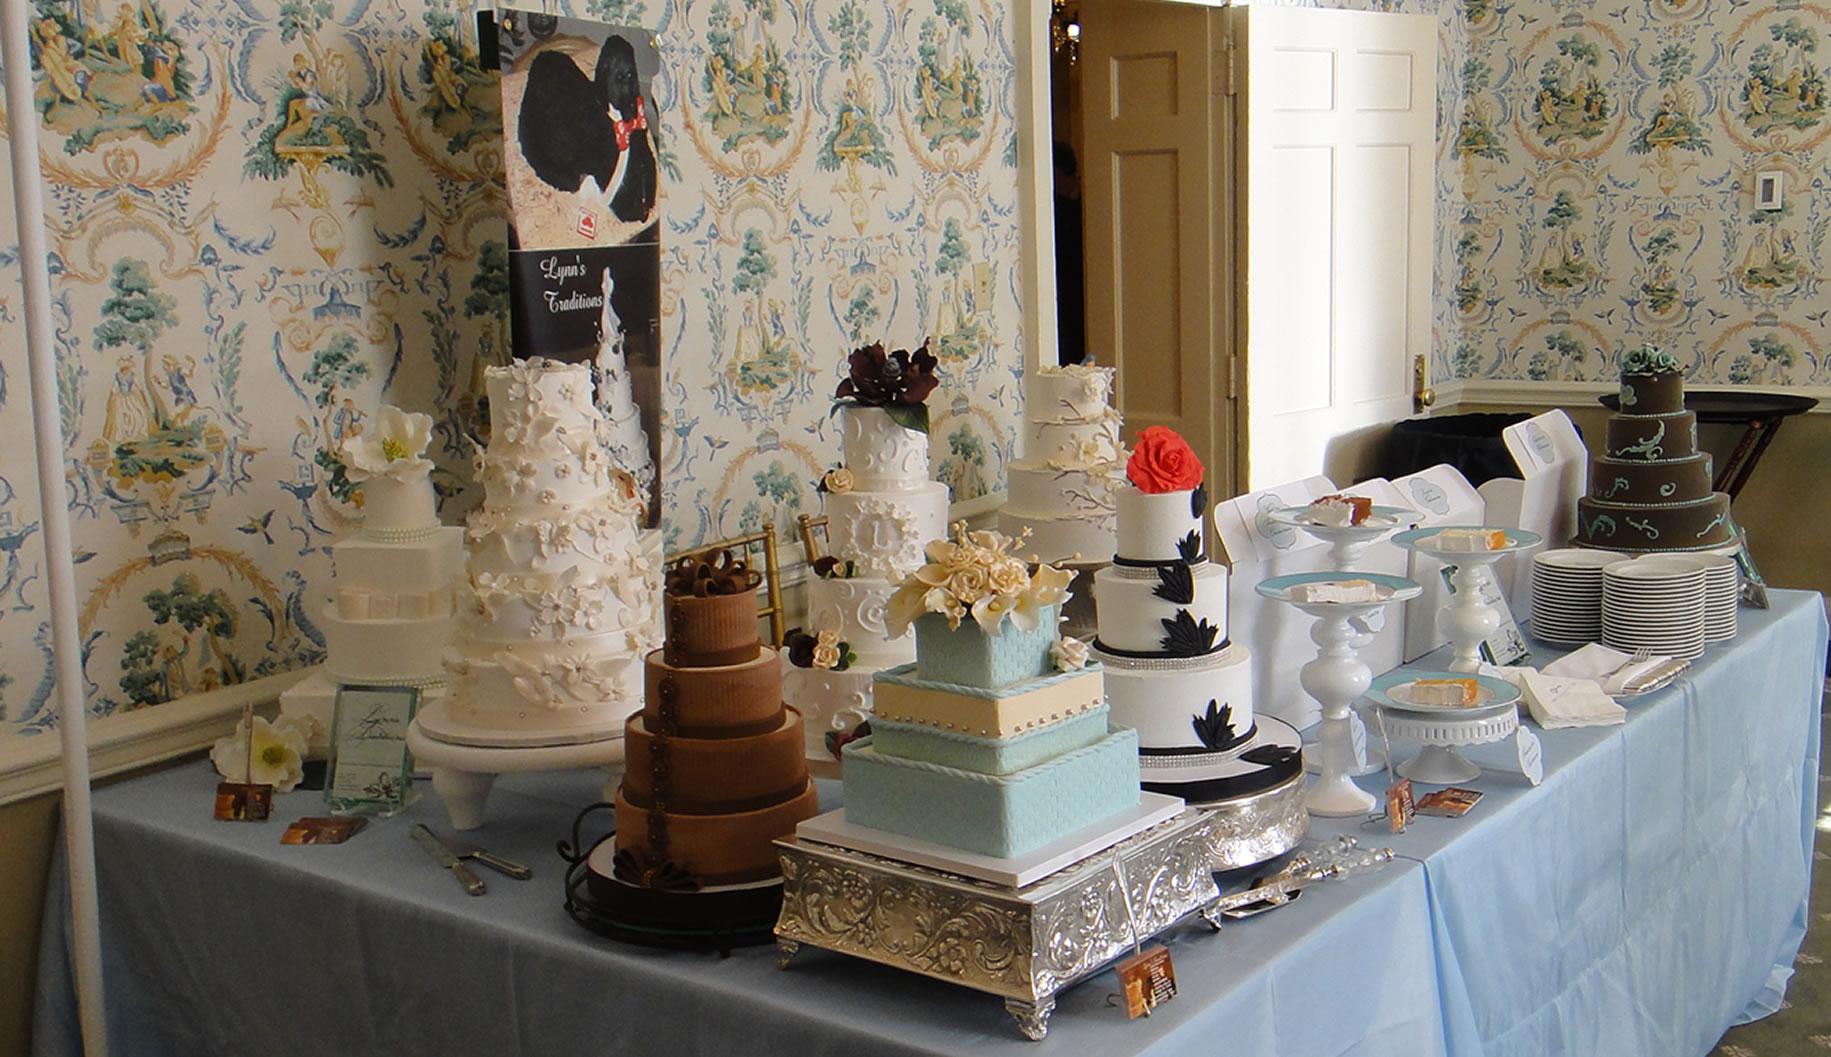 NC Wedding Cakes Raleigh Cake Baker Wedding Cakes Raleigh